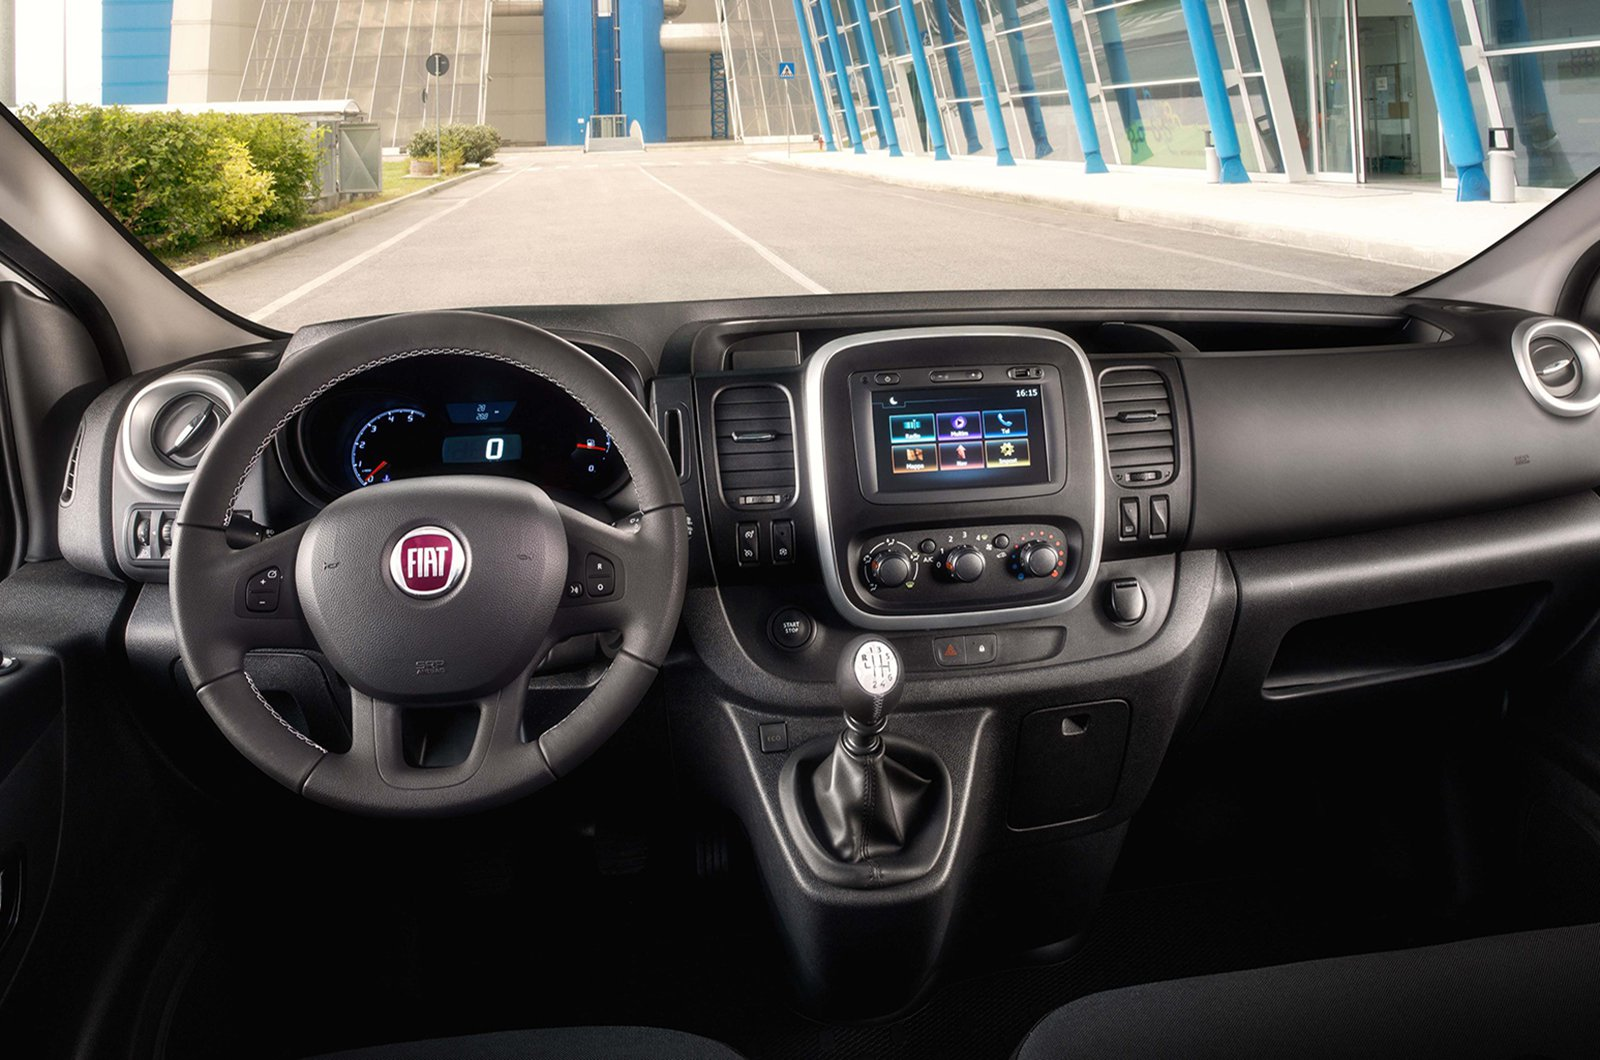 Fiat Talento - interior